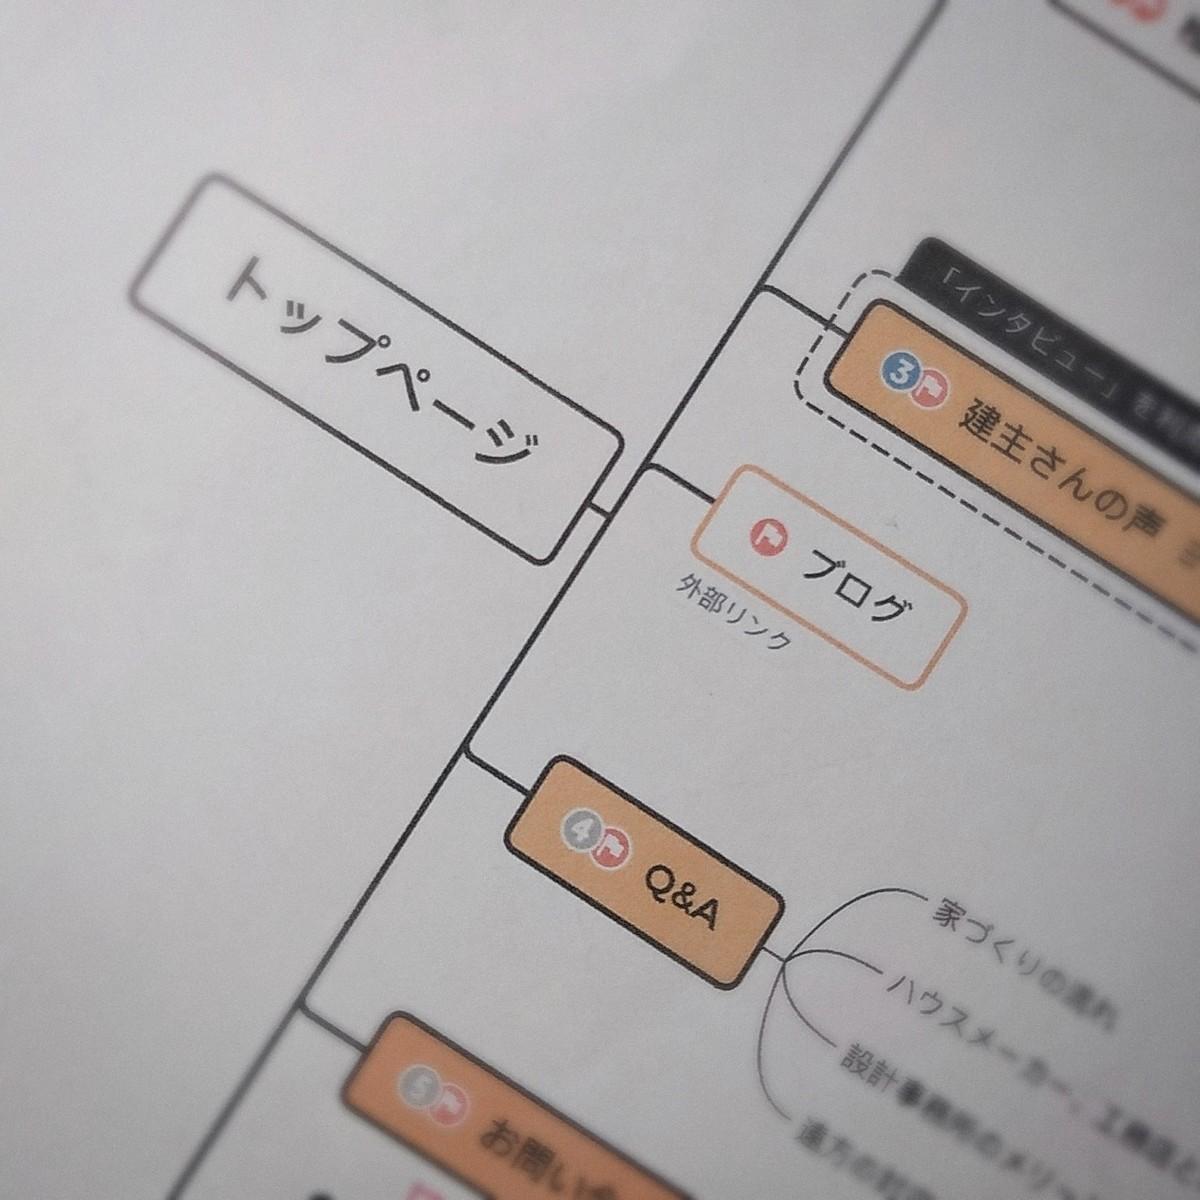 f:id:yusei2000:20200526173527j:plain